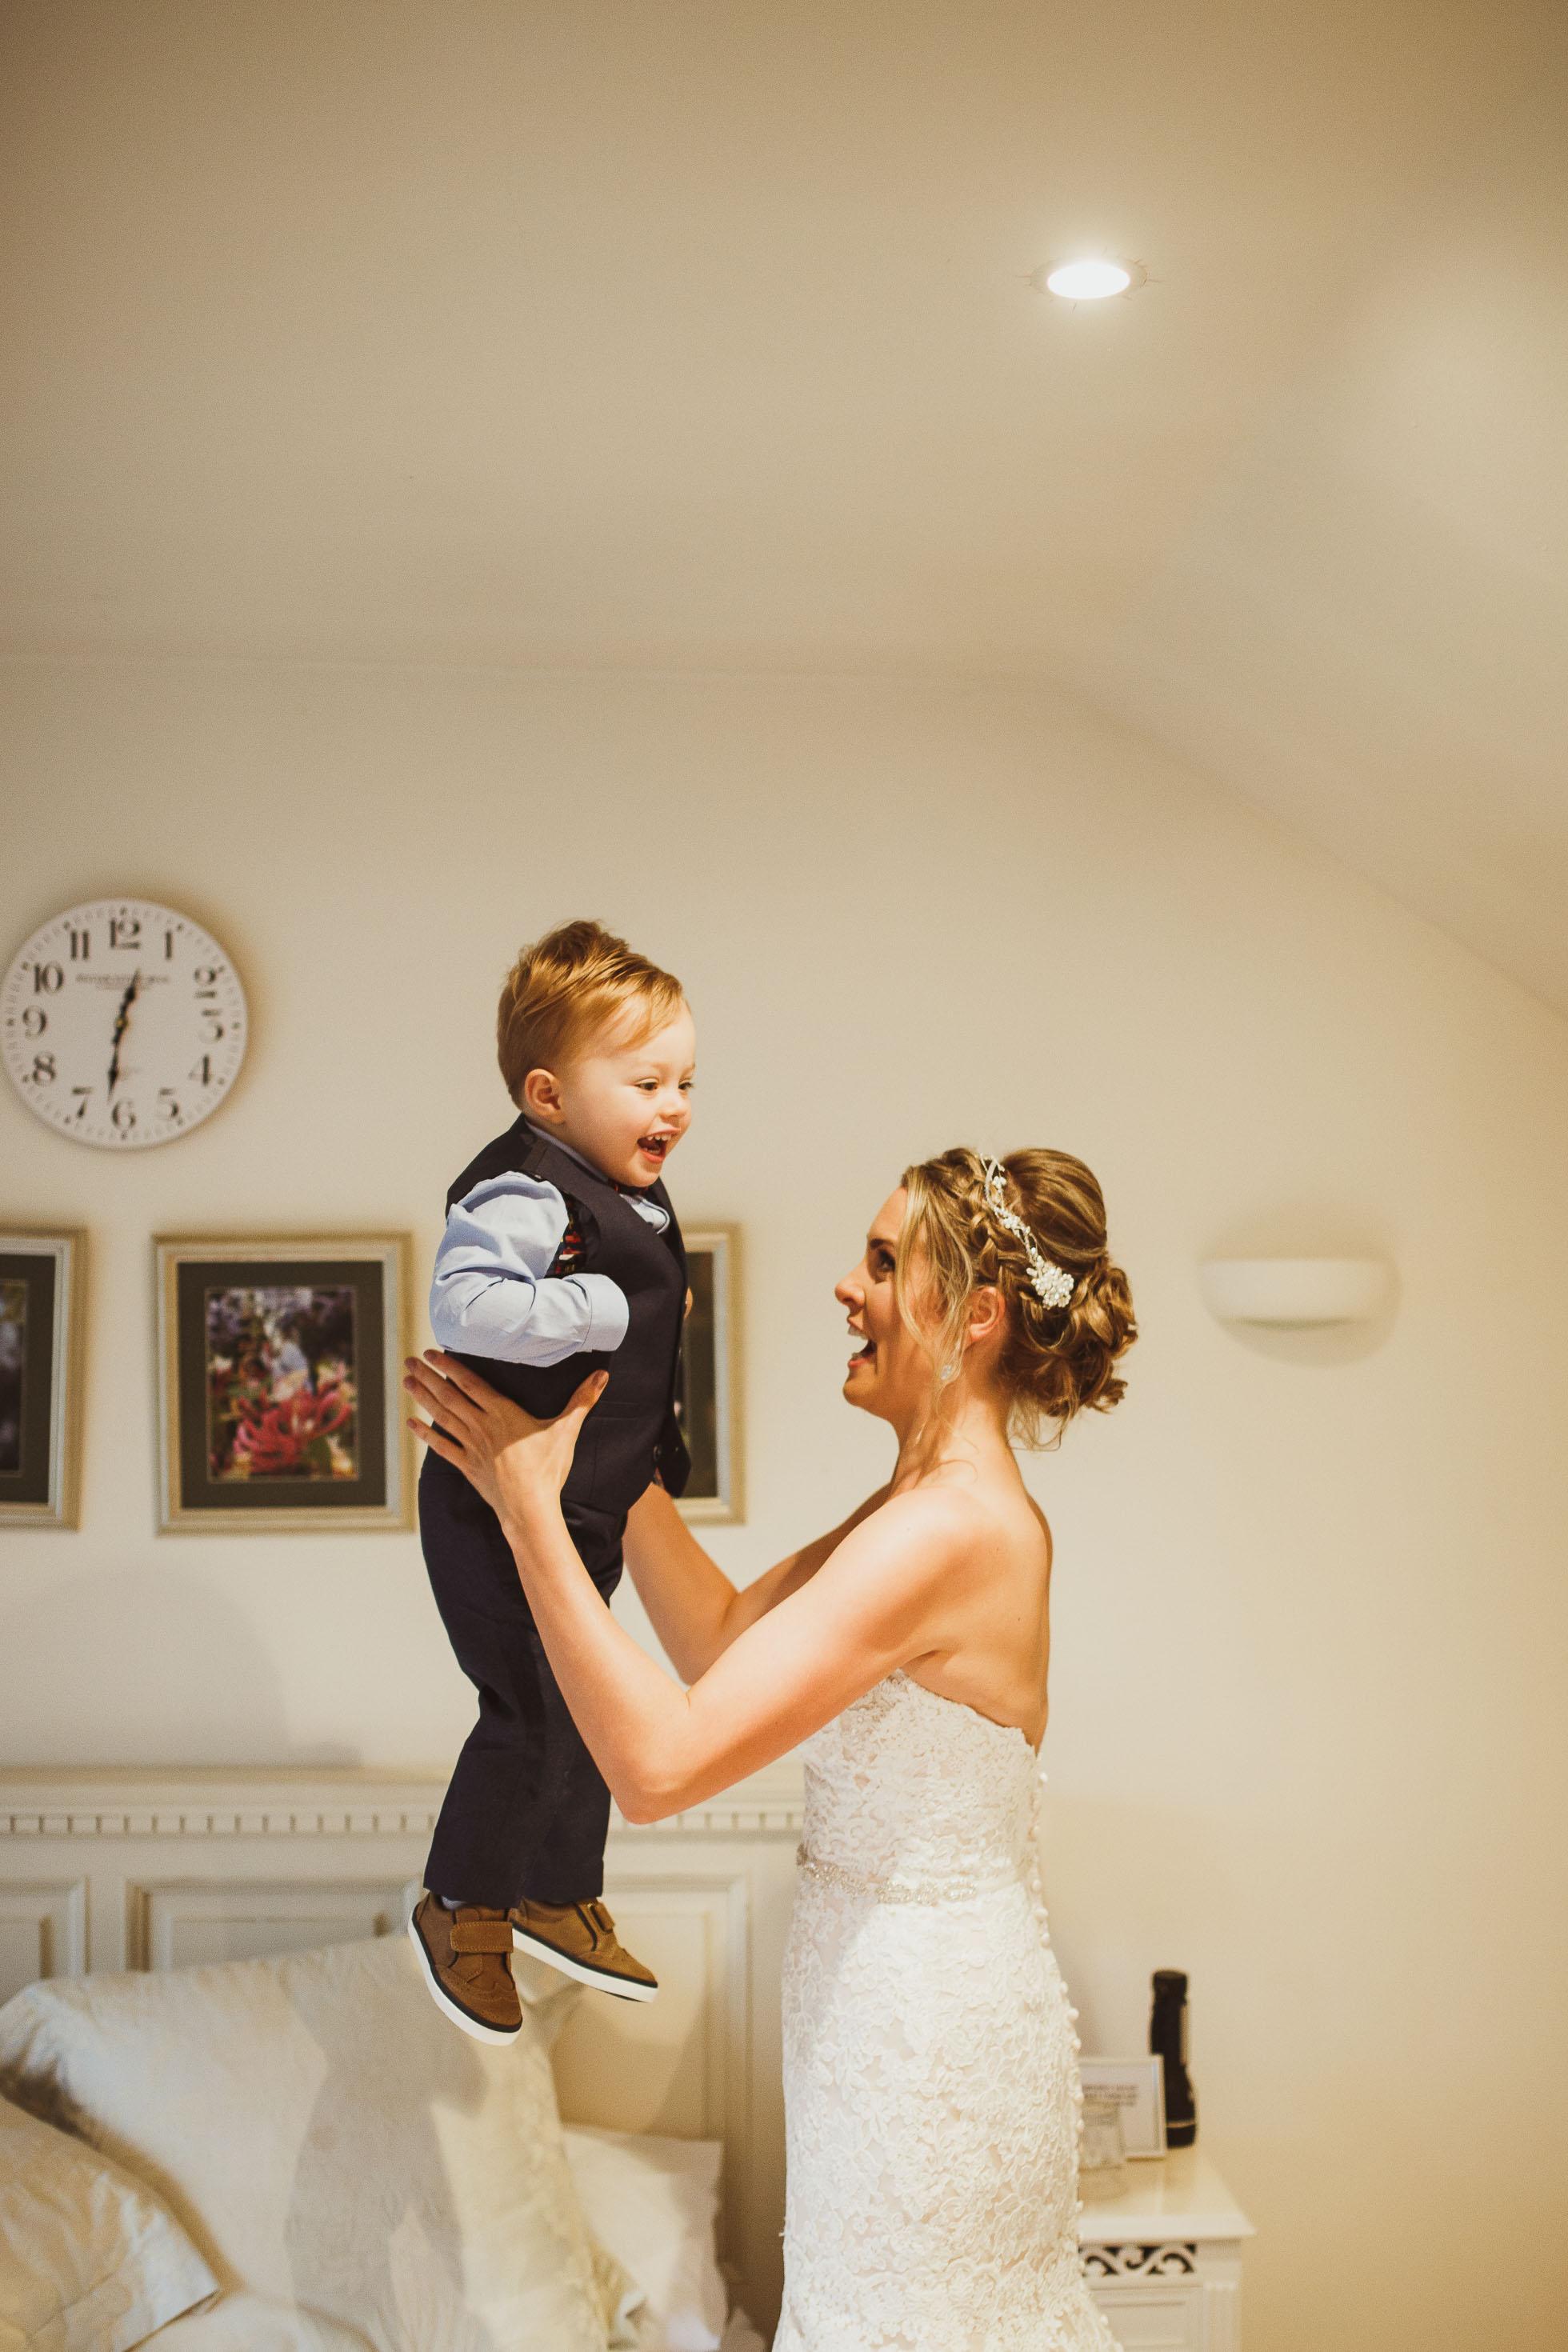 hilltop country house wedding photographer-25.jpg